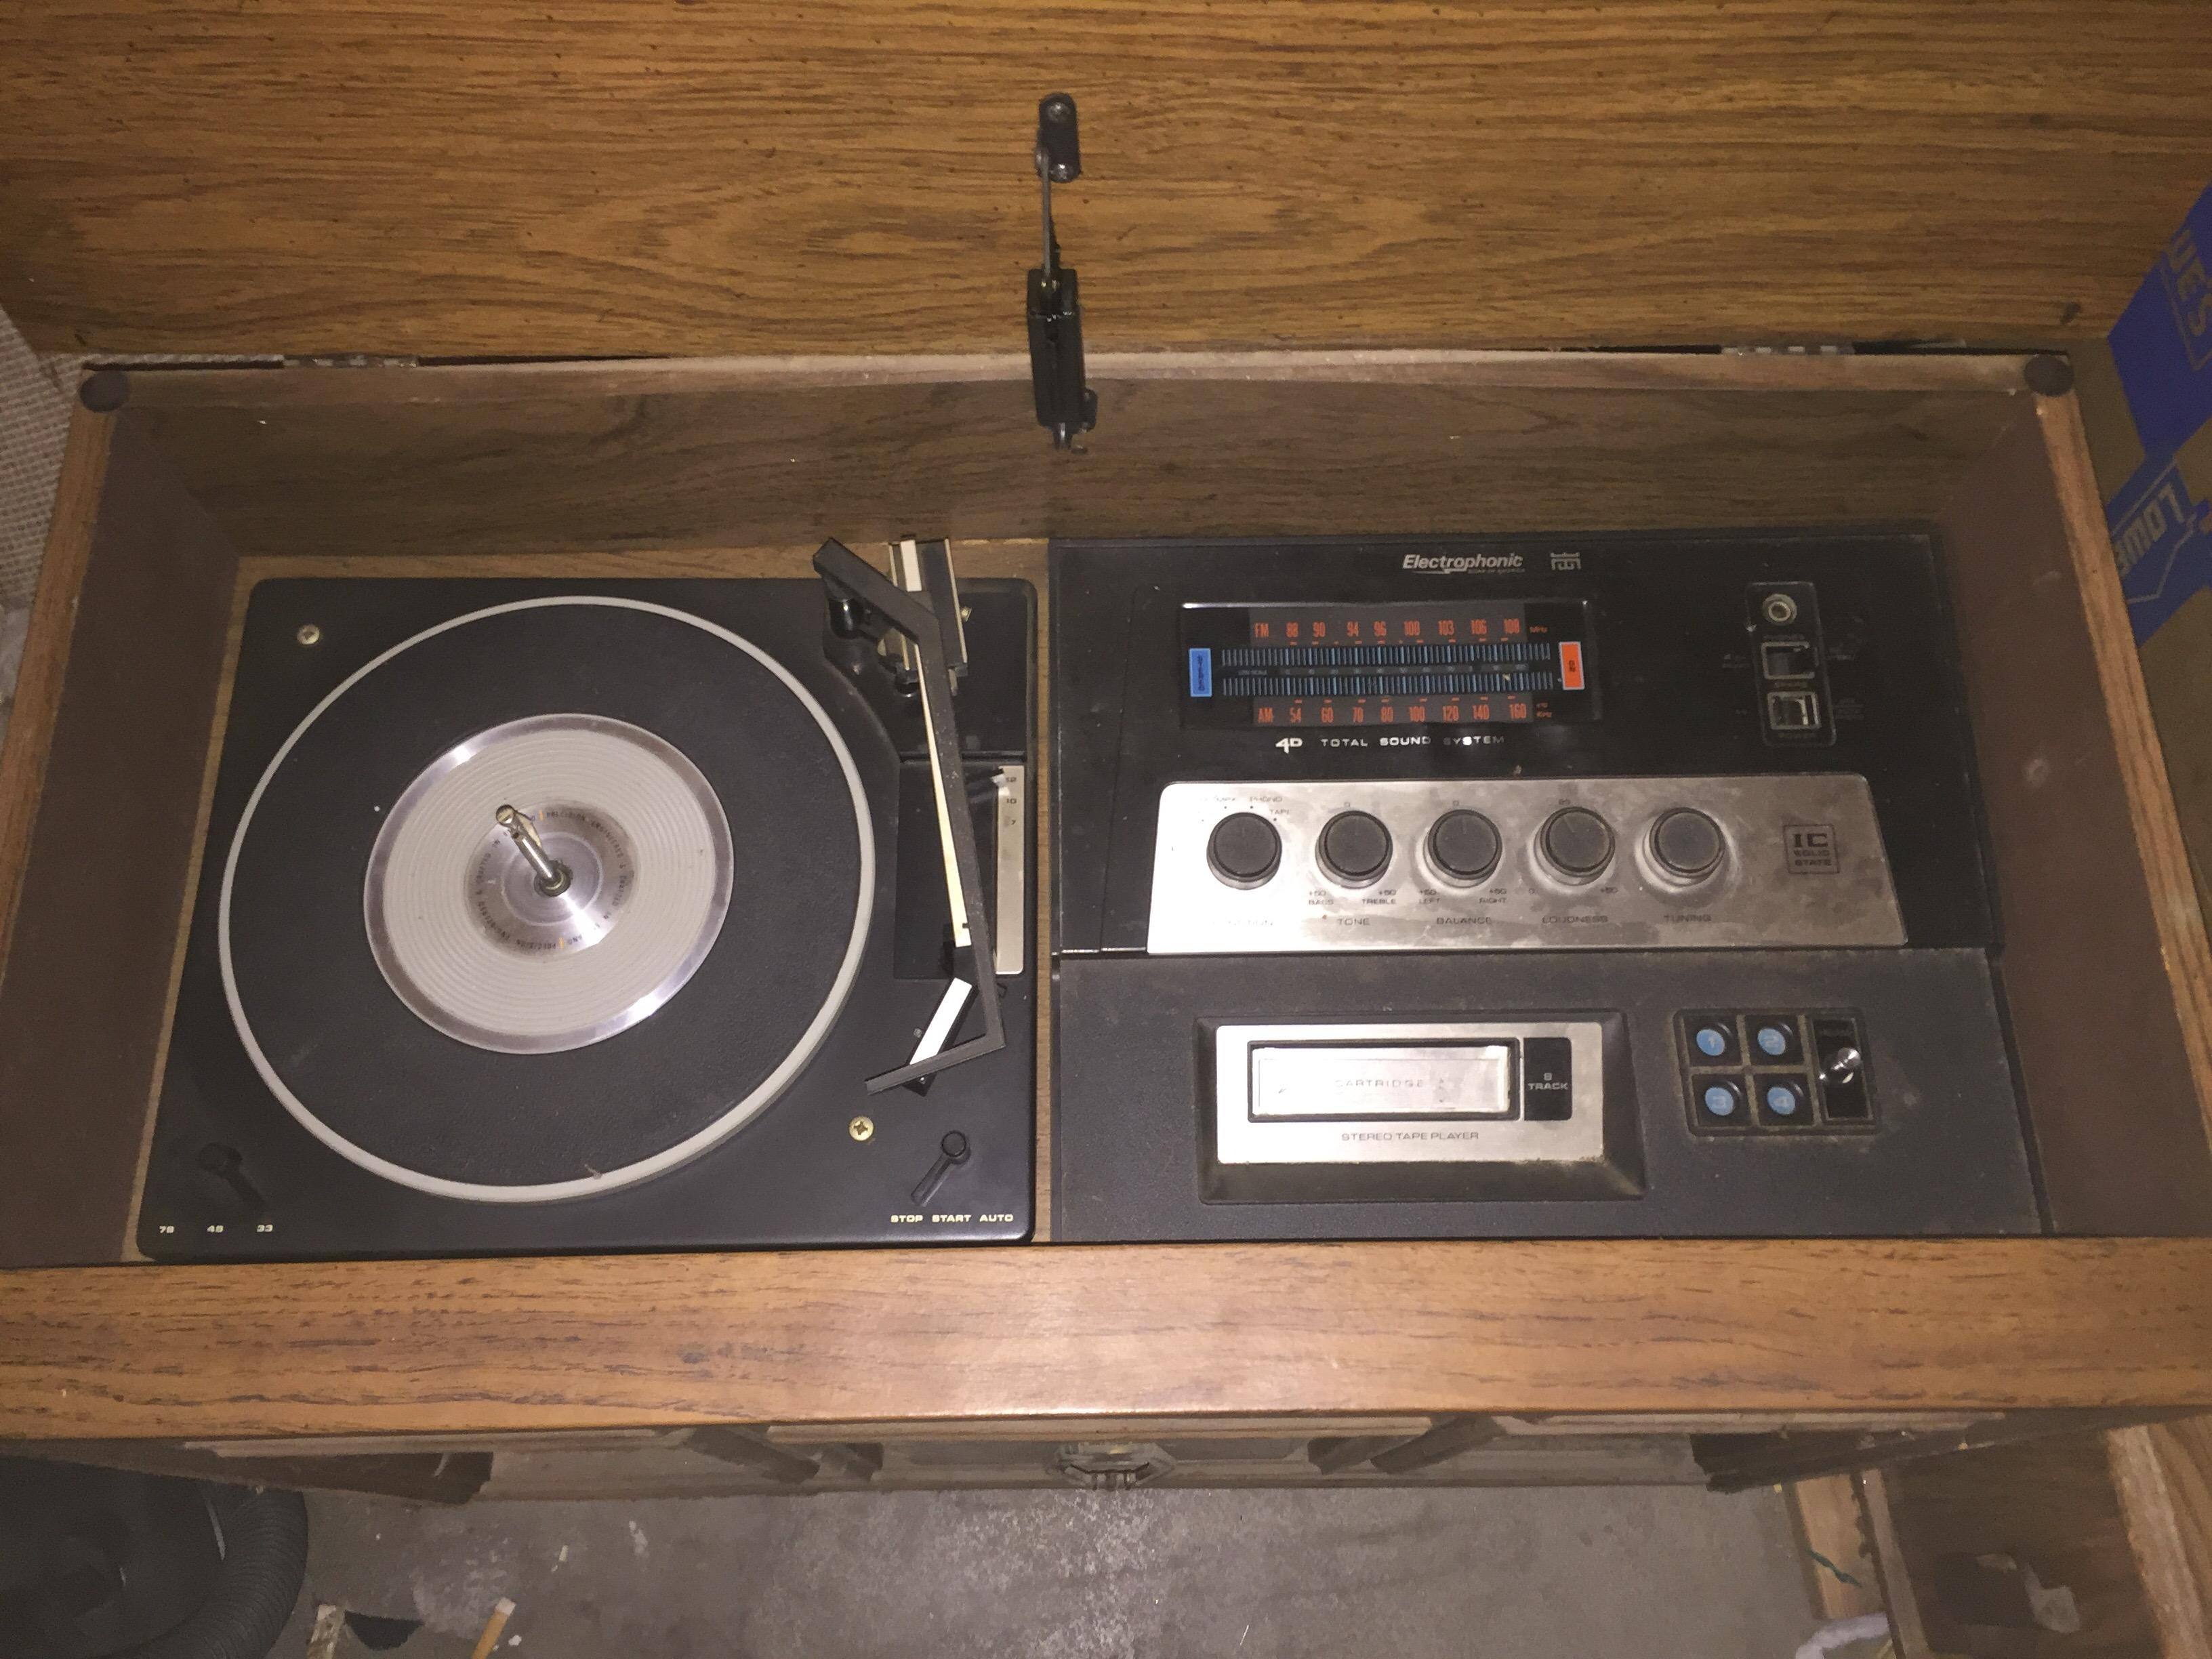 Antique Electrophonic Console Stereo Antique Appraisal